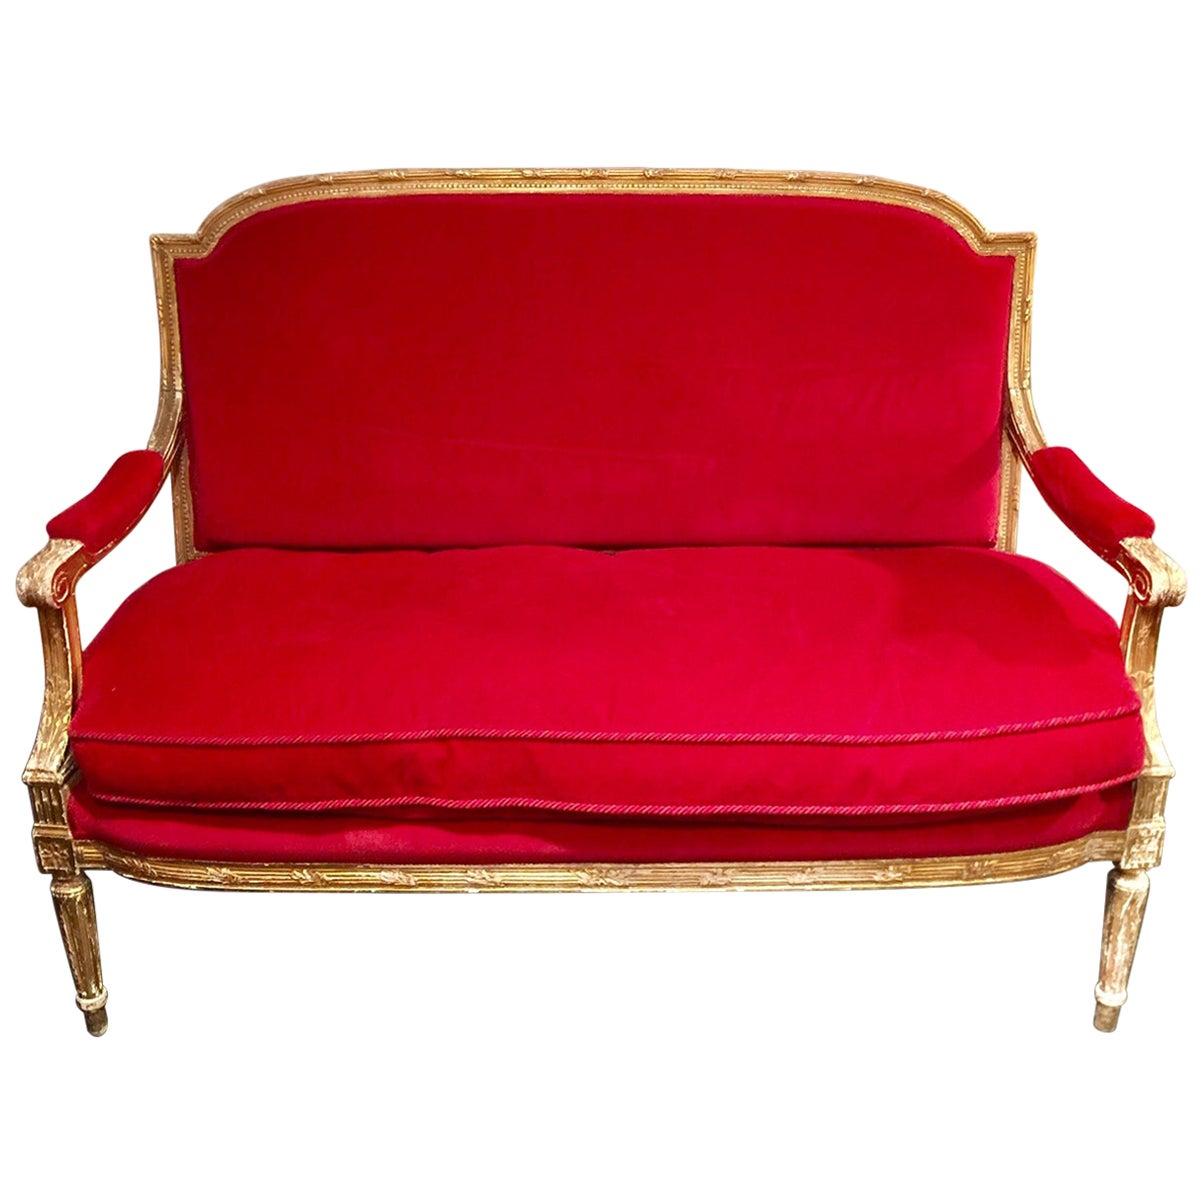 French Giltwood Settee Sofa, Style Louis XVI, Red Velvet, 19th Century